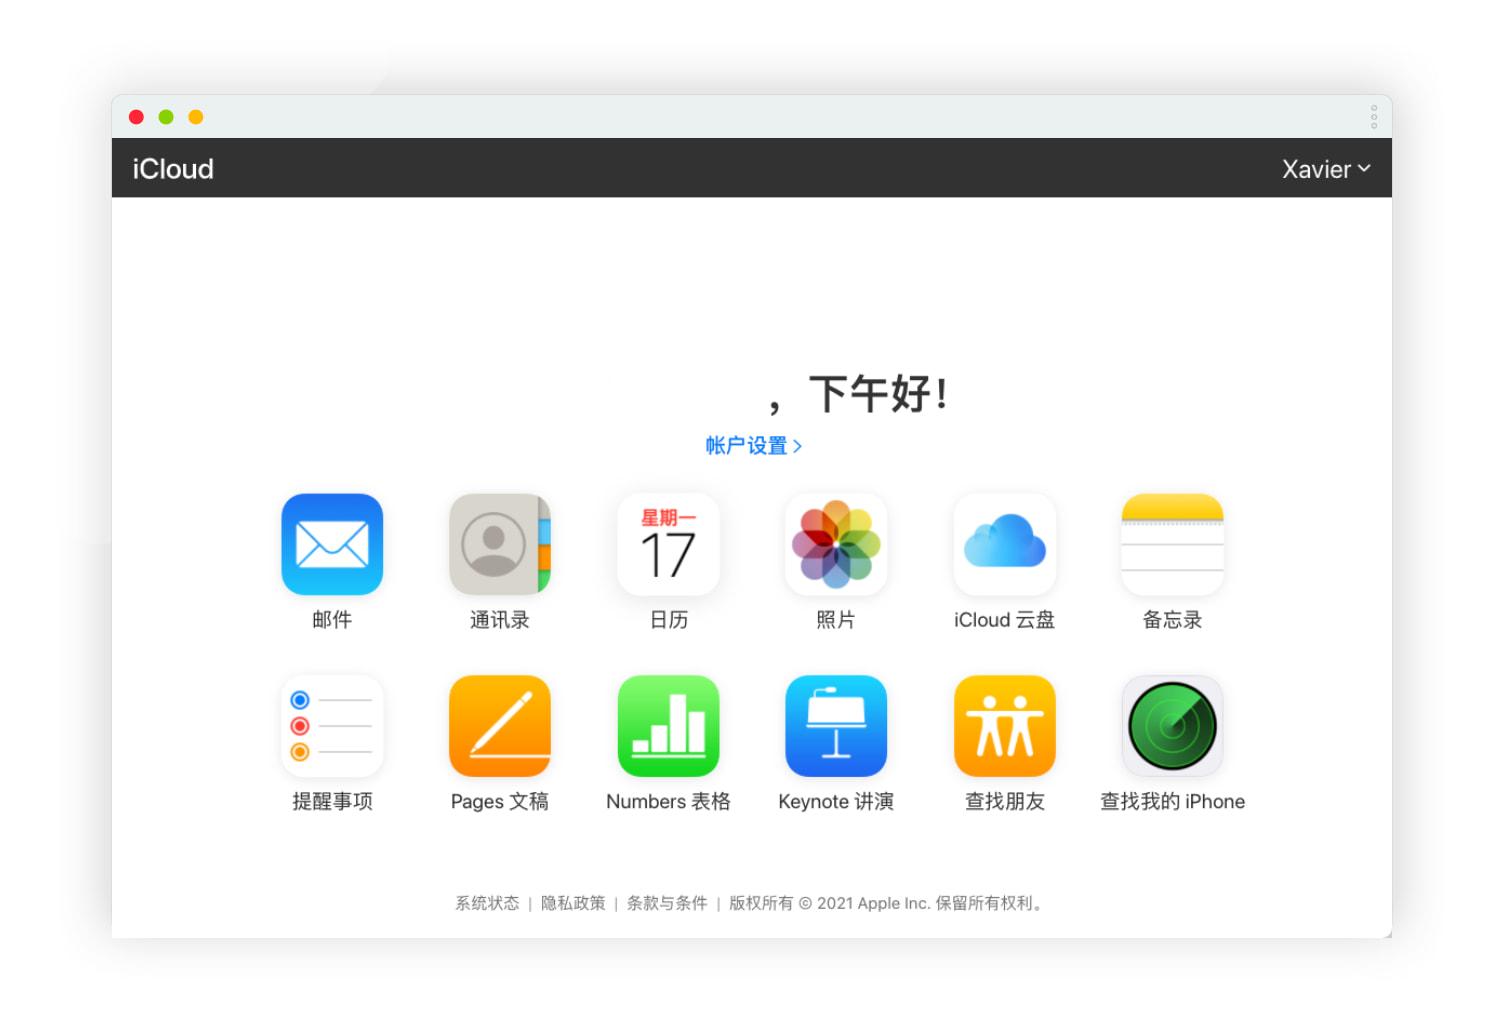 iCloud-网页版